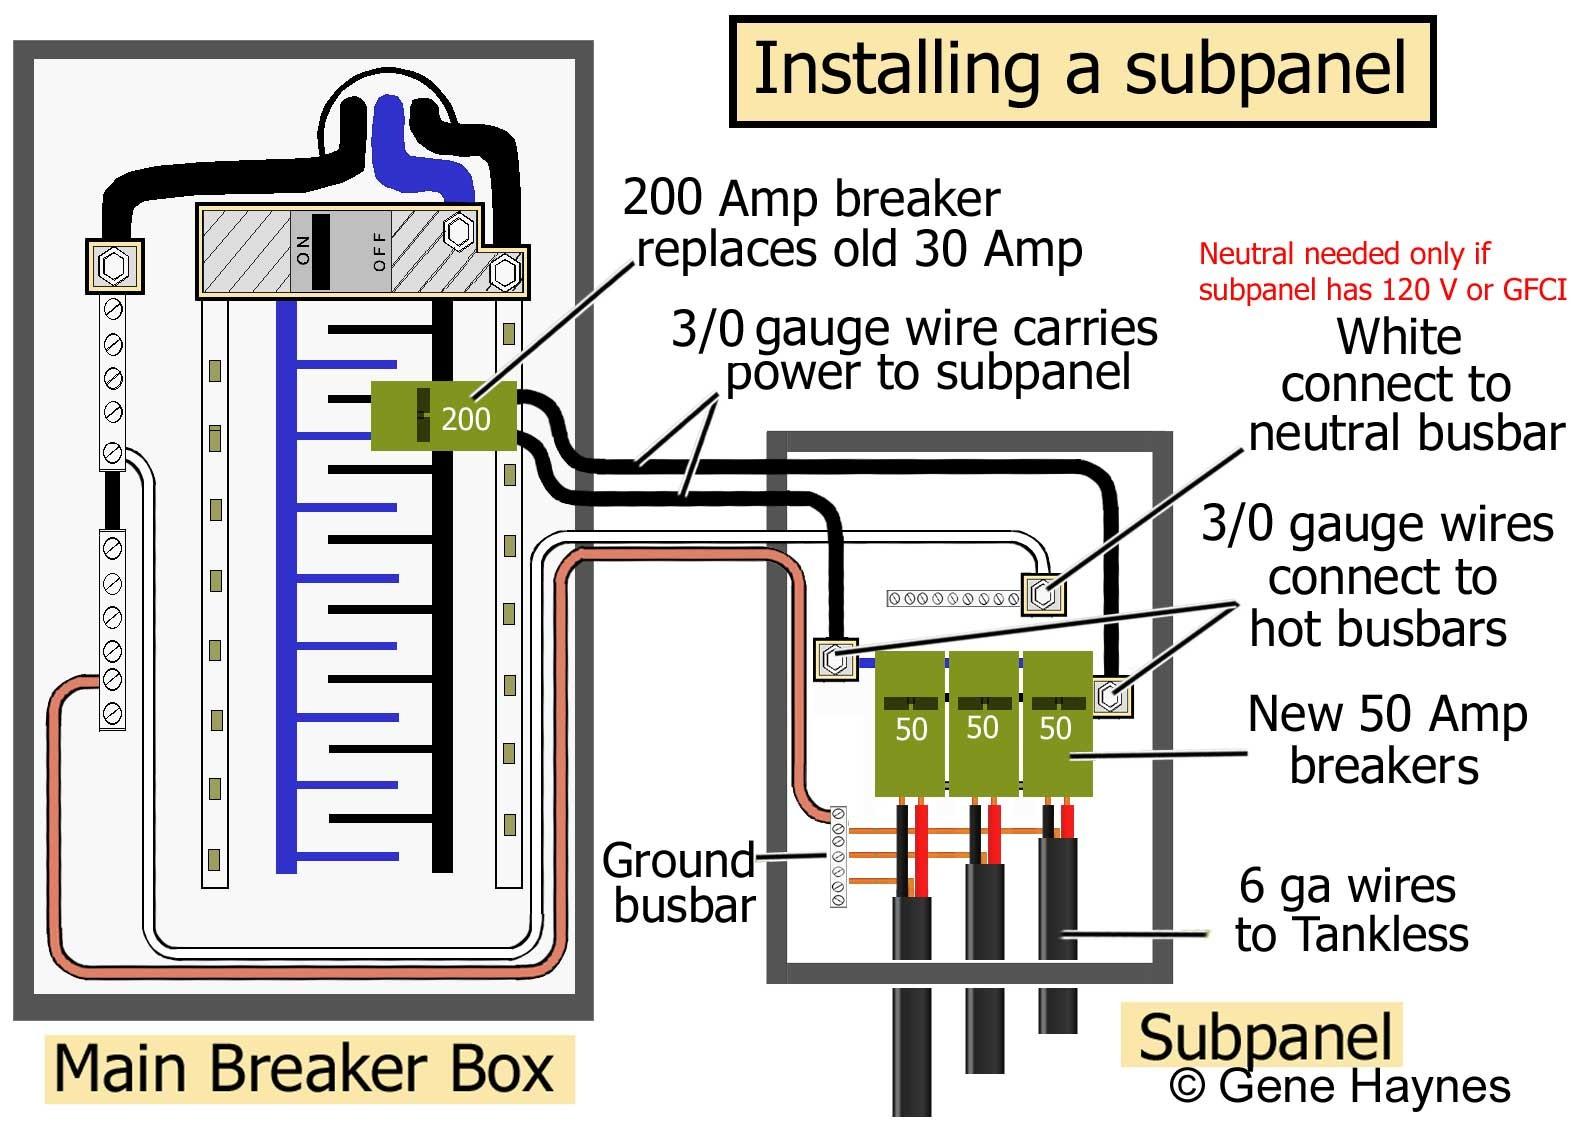 how to change 120 volt subpanel to 240 volt subpanel generator sub panel wiring diagram larger